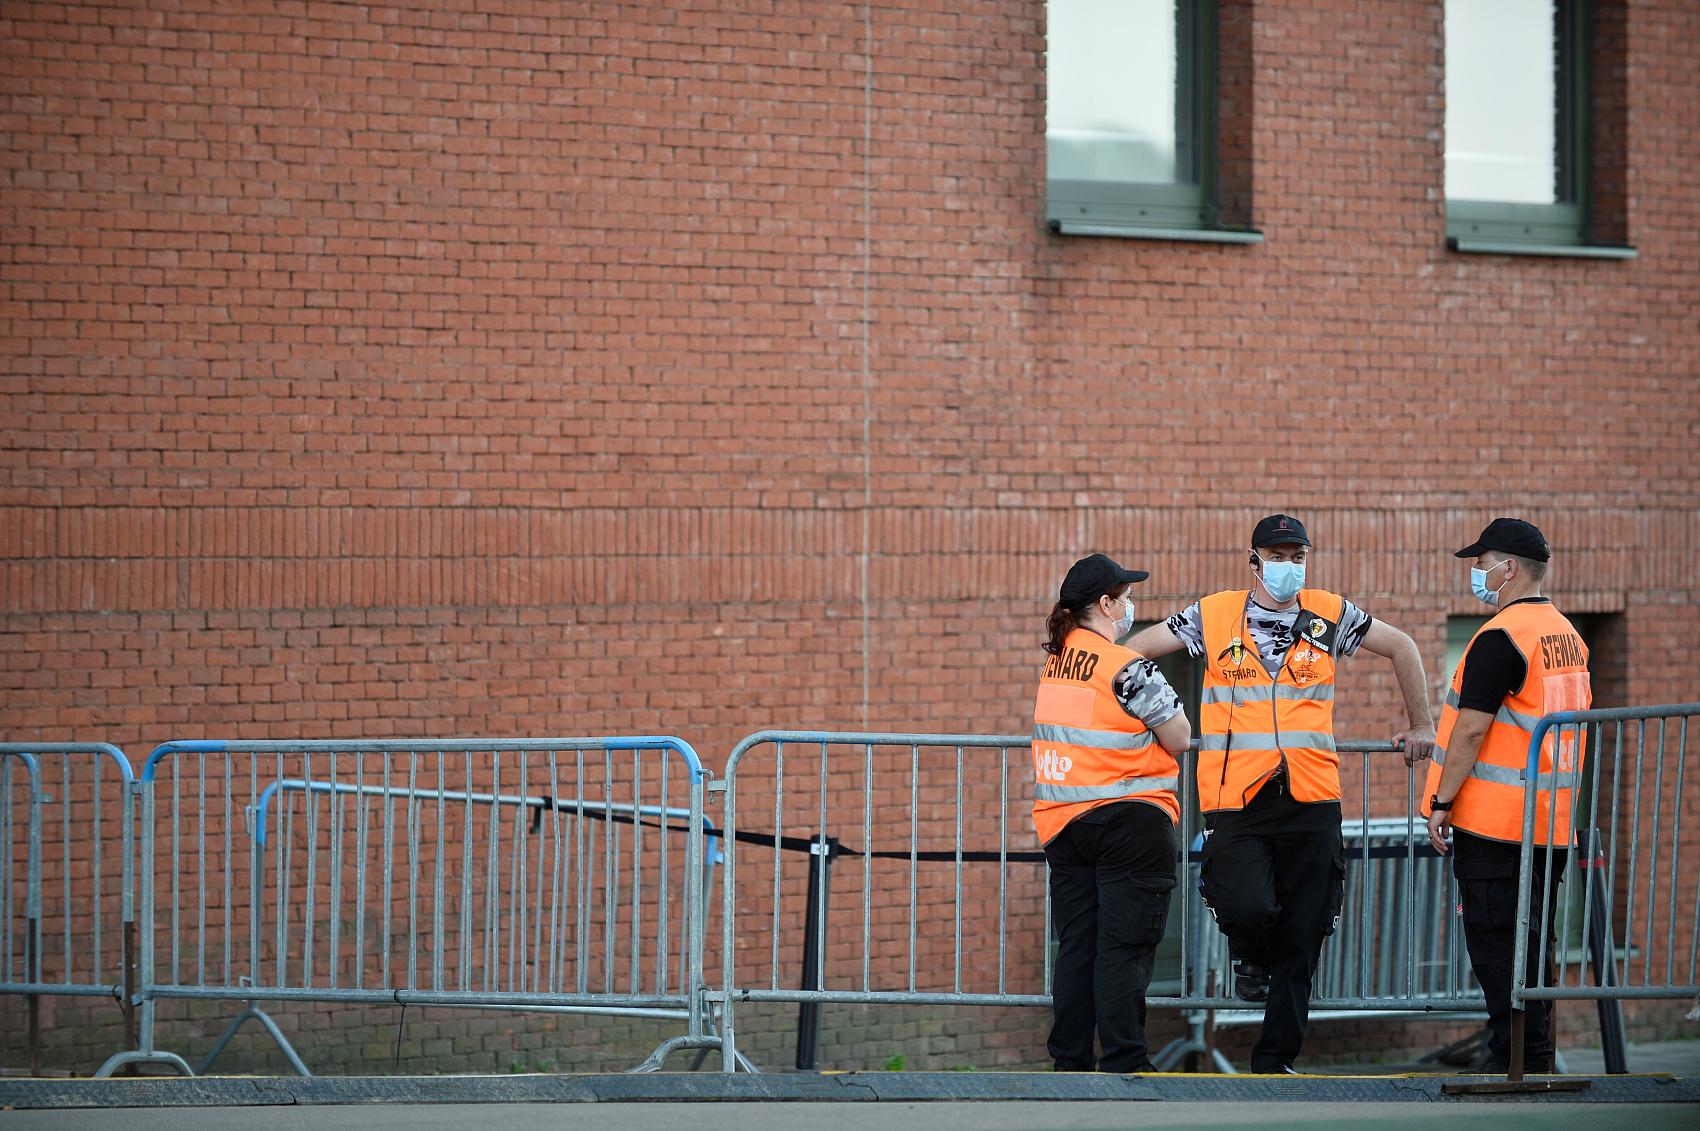 Brussels region makes face masks compulsory: regional government